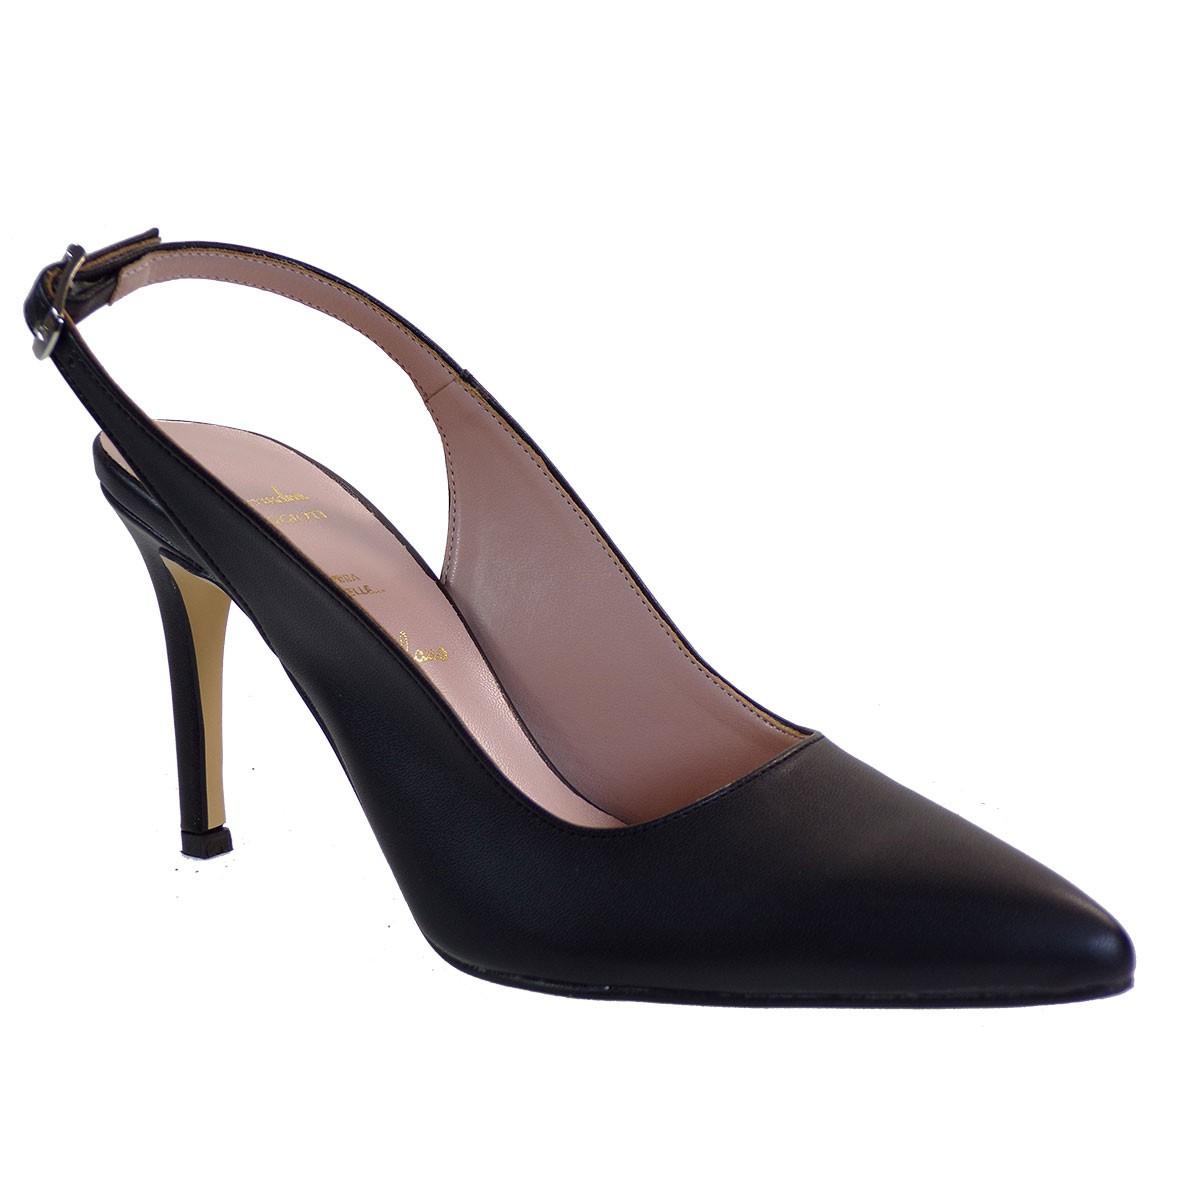 Alessandra Paggioti Γυναικεία Παπούτσια Γόβες 81000 Μαύρο Ματ